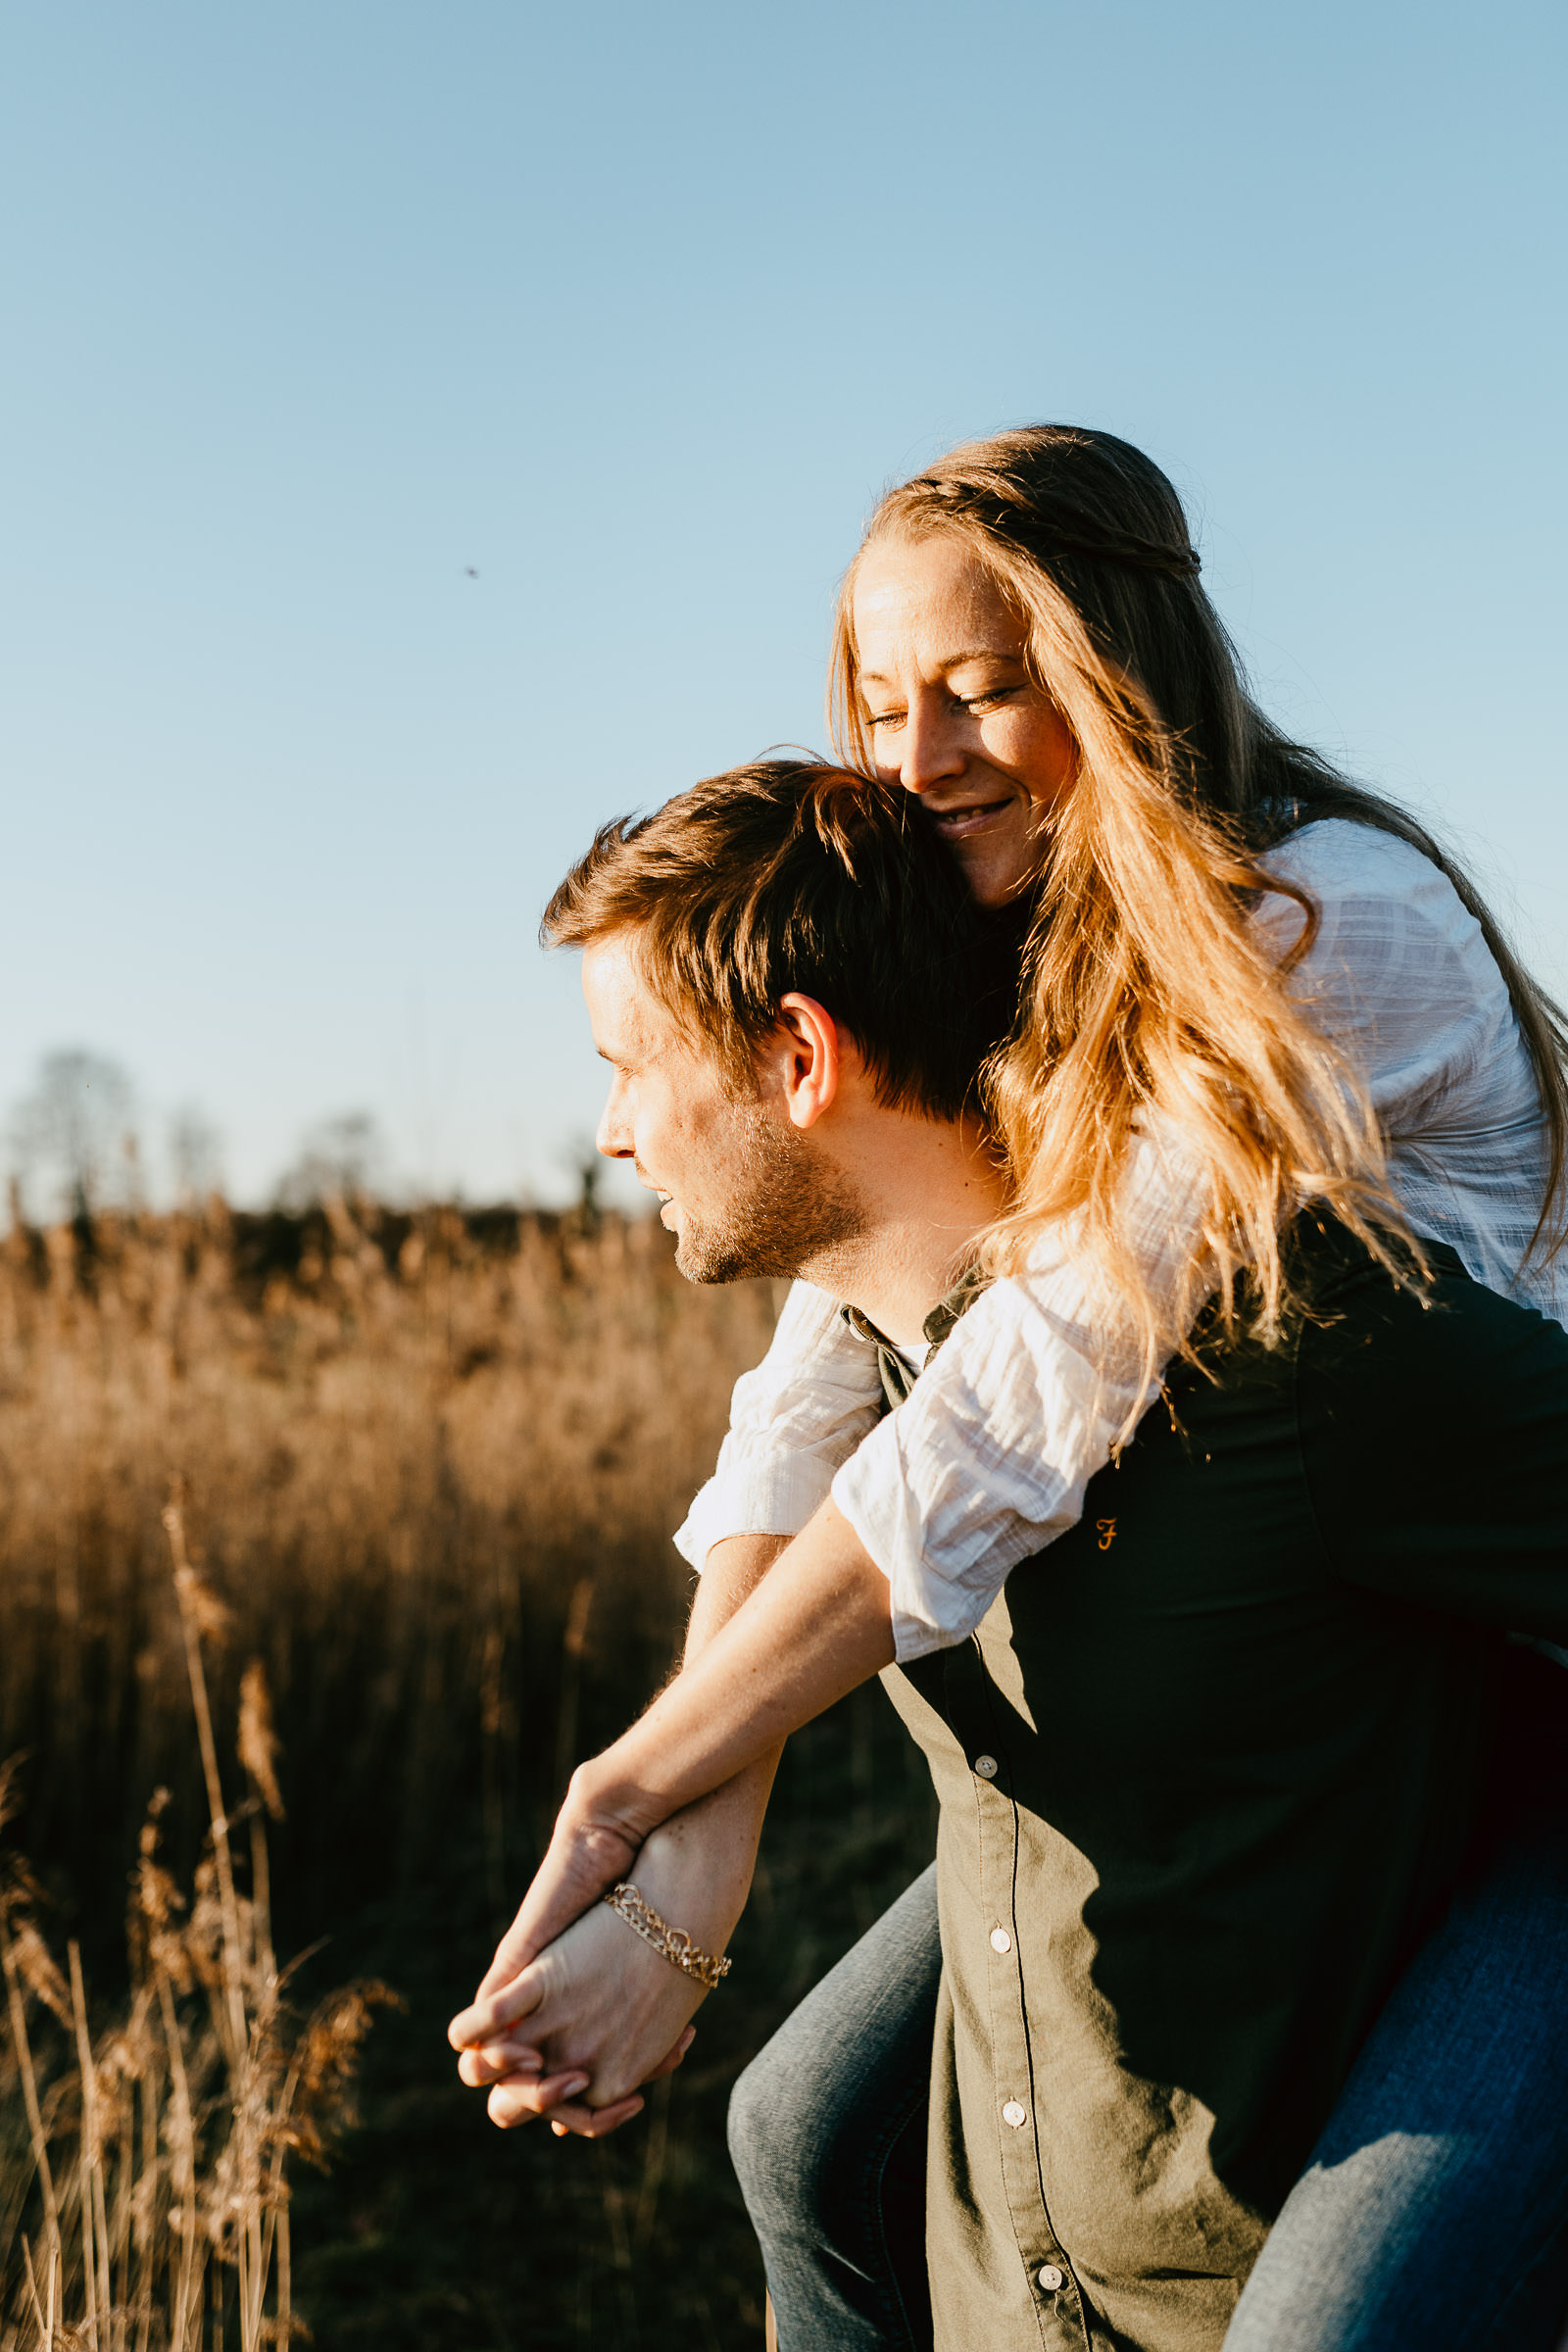 Paarfoto Frau sitzt Huckepack in der Sonne